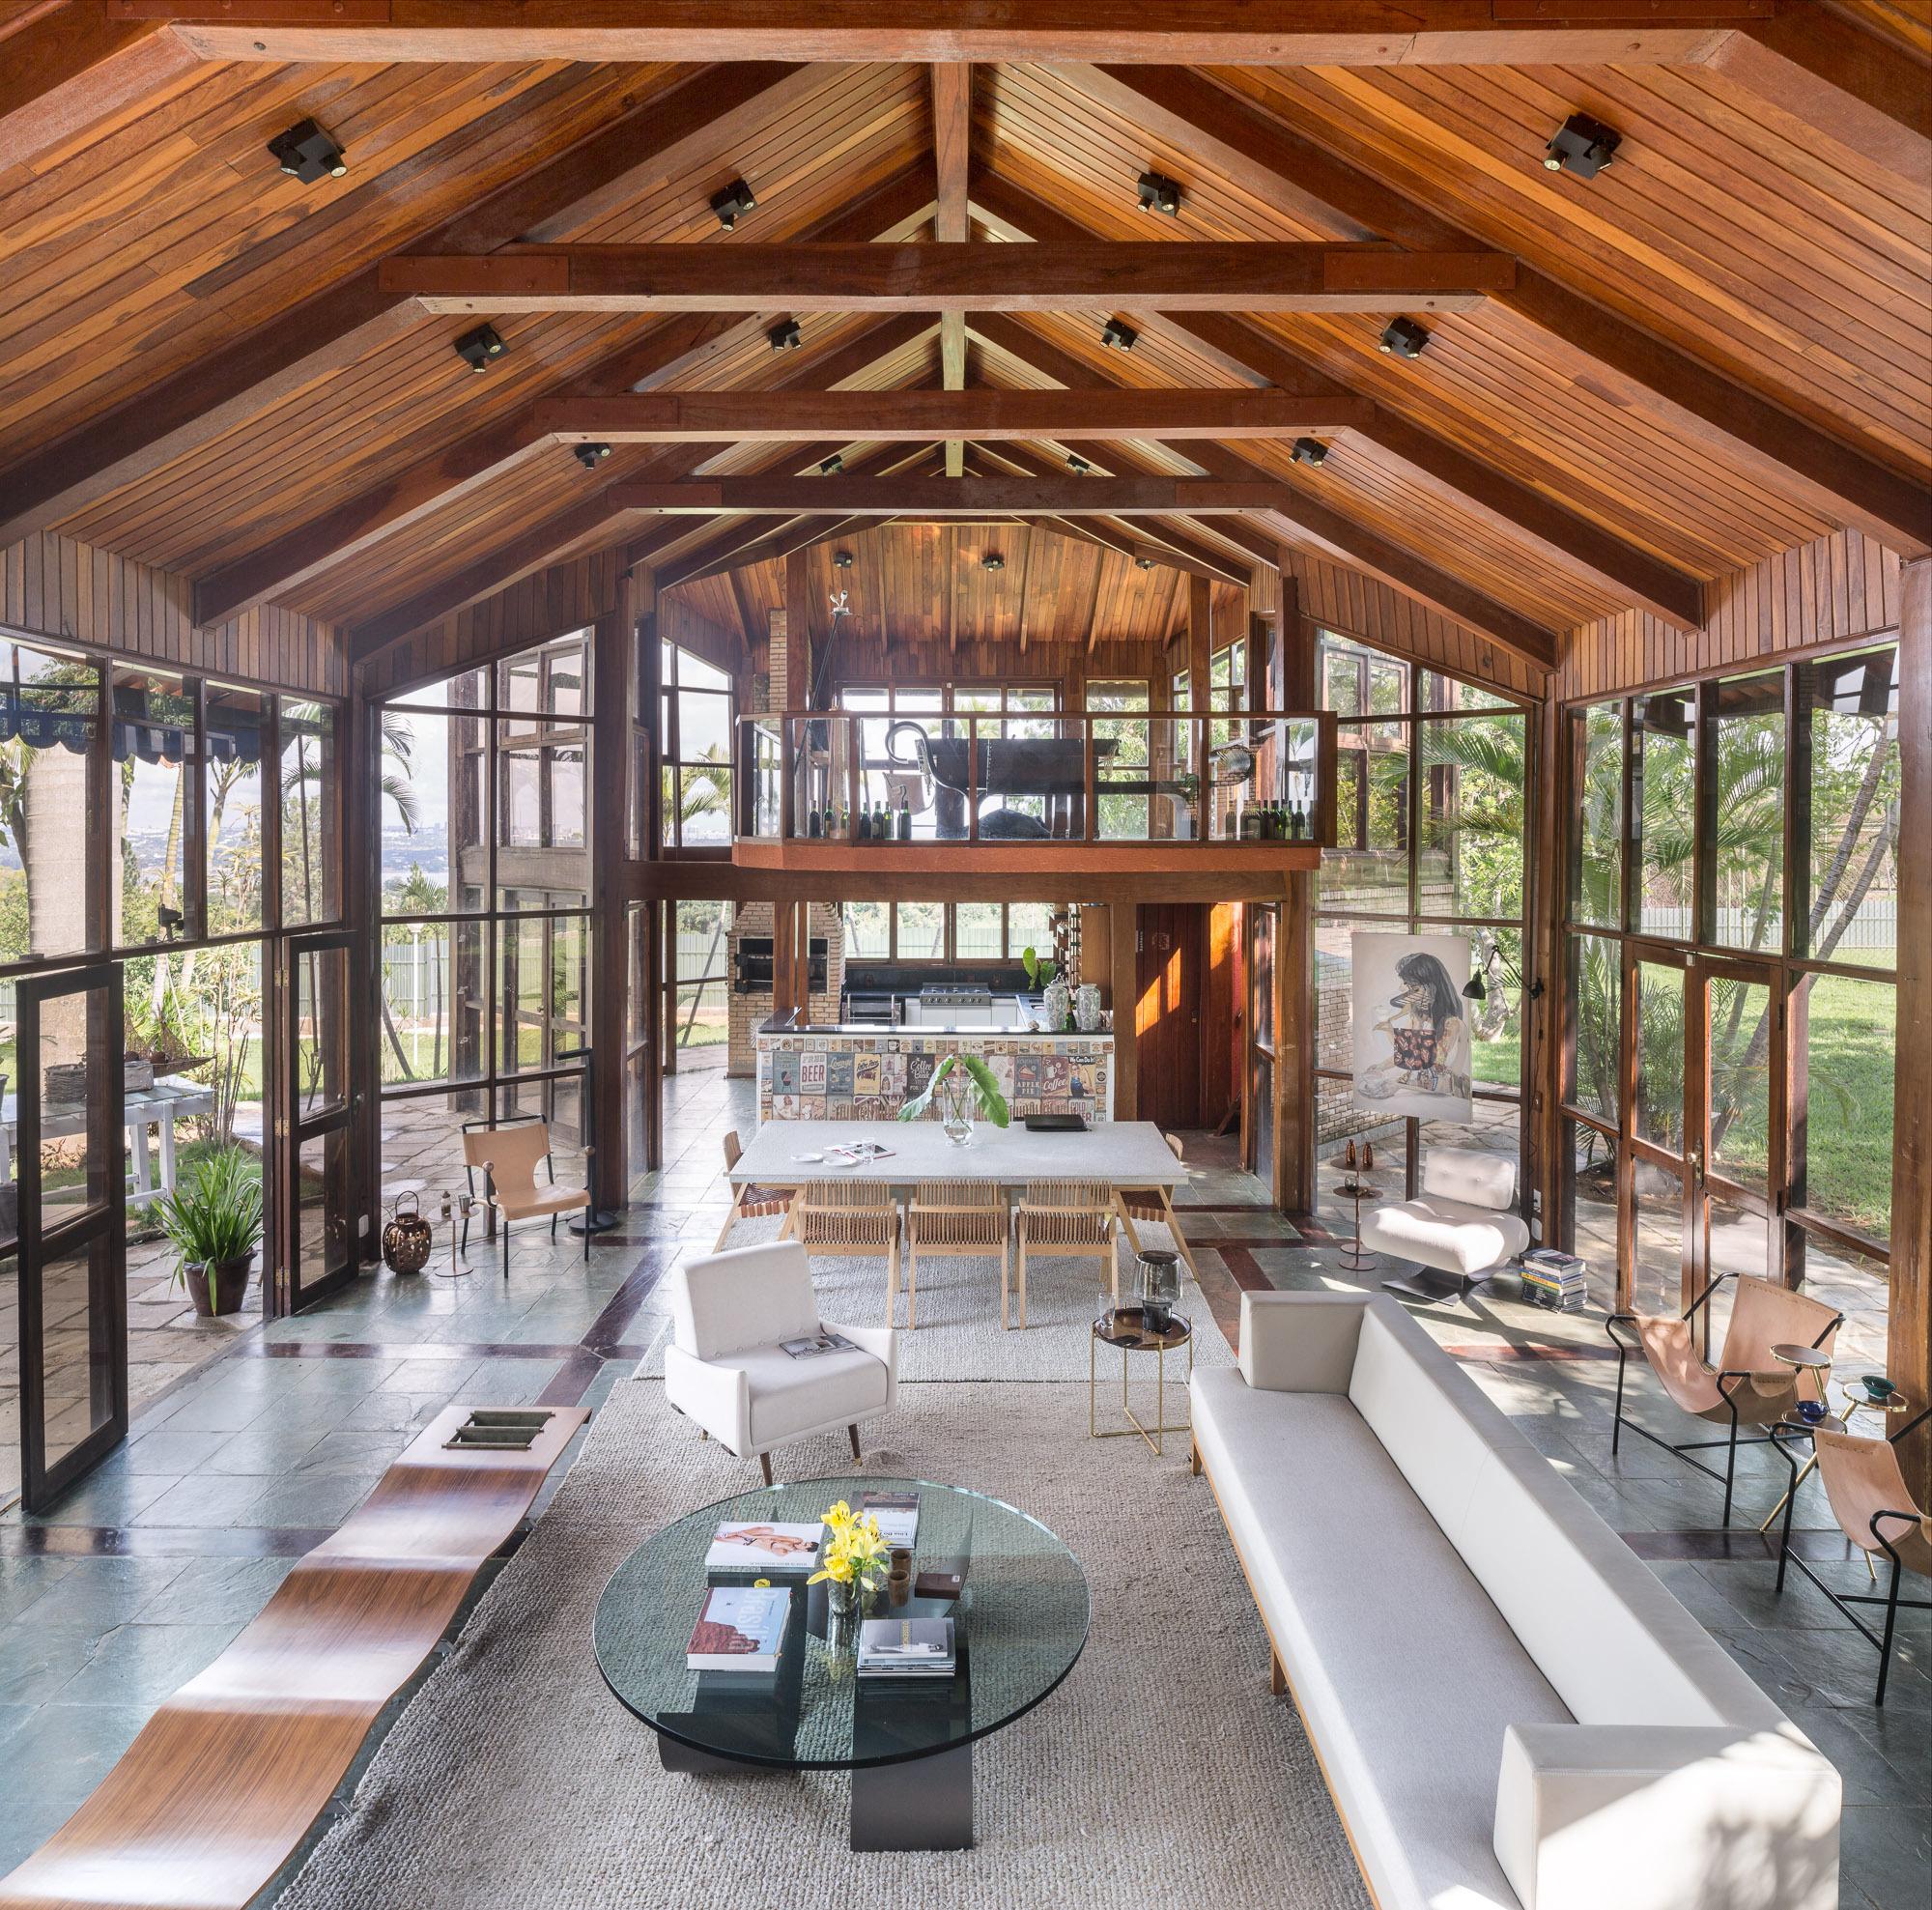 The Brazilian House - Six 1 Eight 8 / Debaixo do Bloco Arquitetura